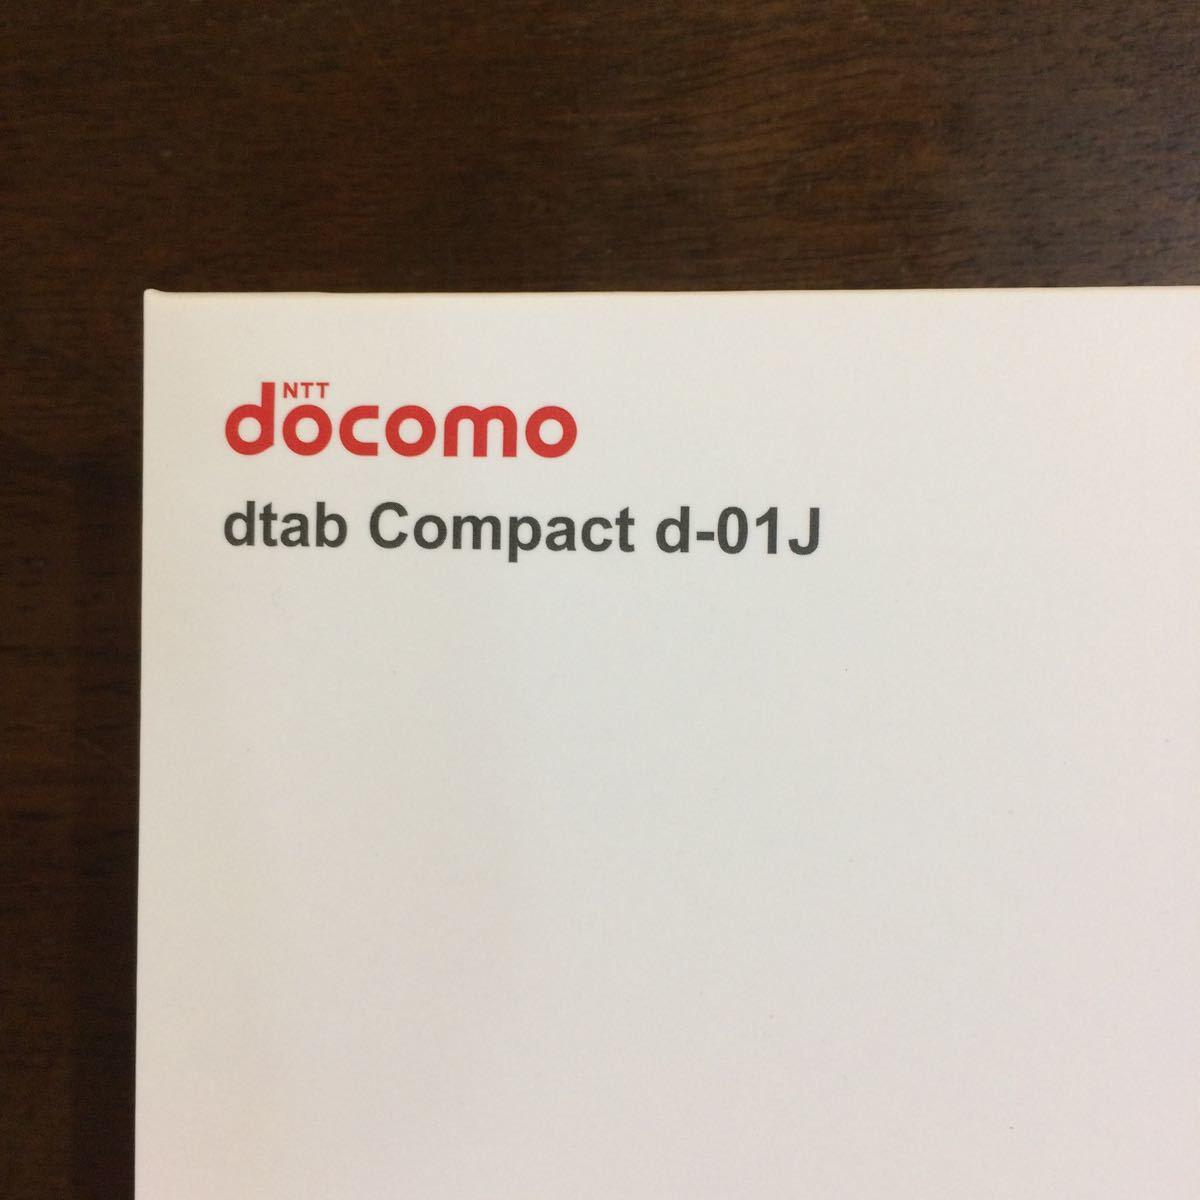 ★docomo ドコモ タブレット dtab compact d-01J シルバー★新品 未使用_画像3